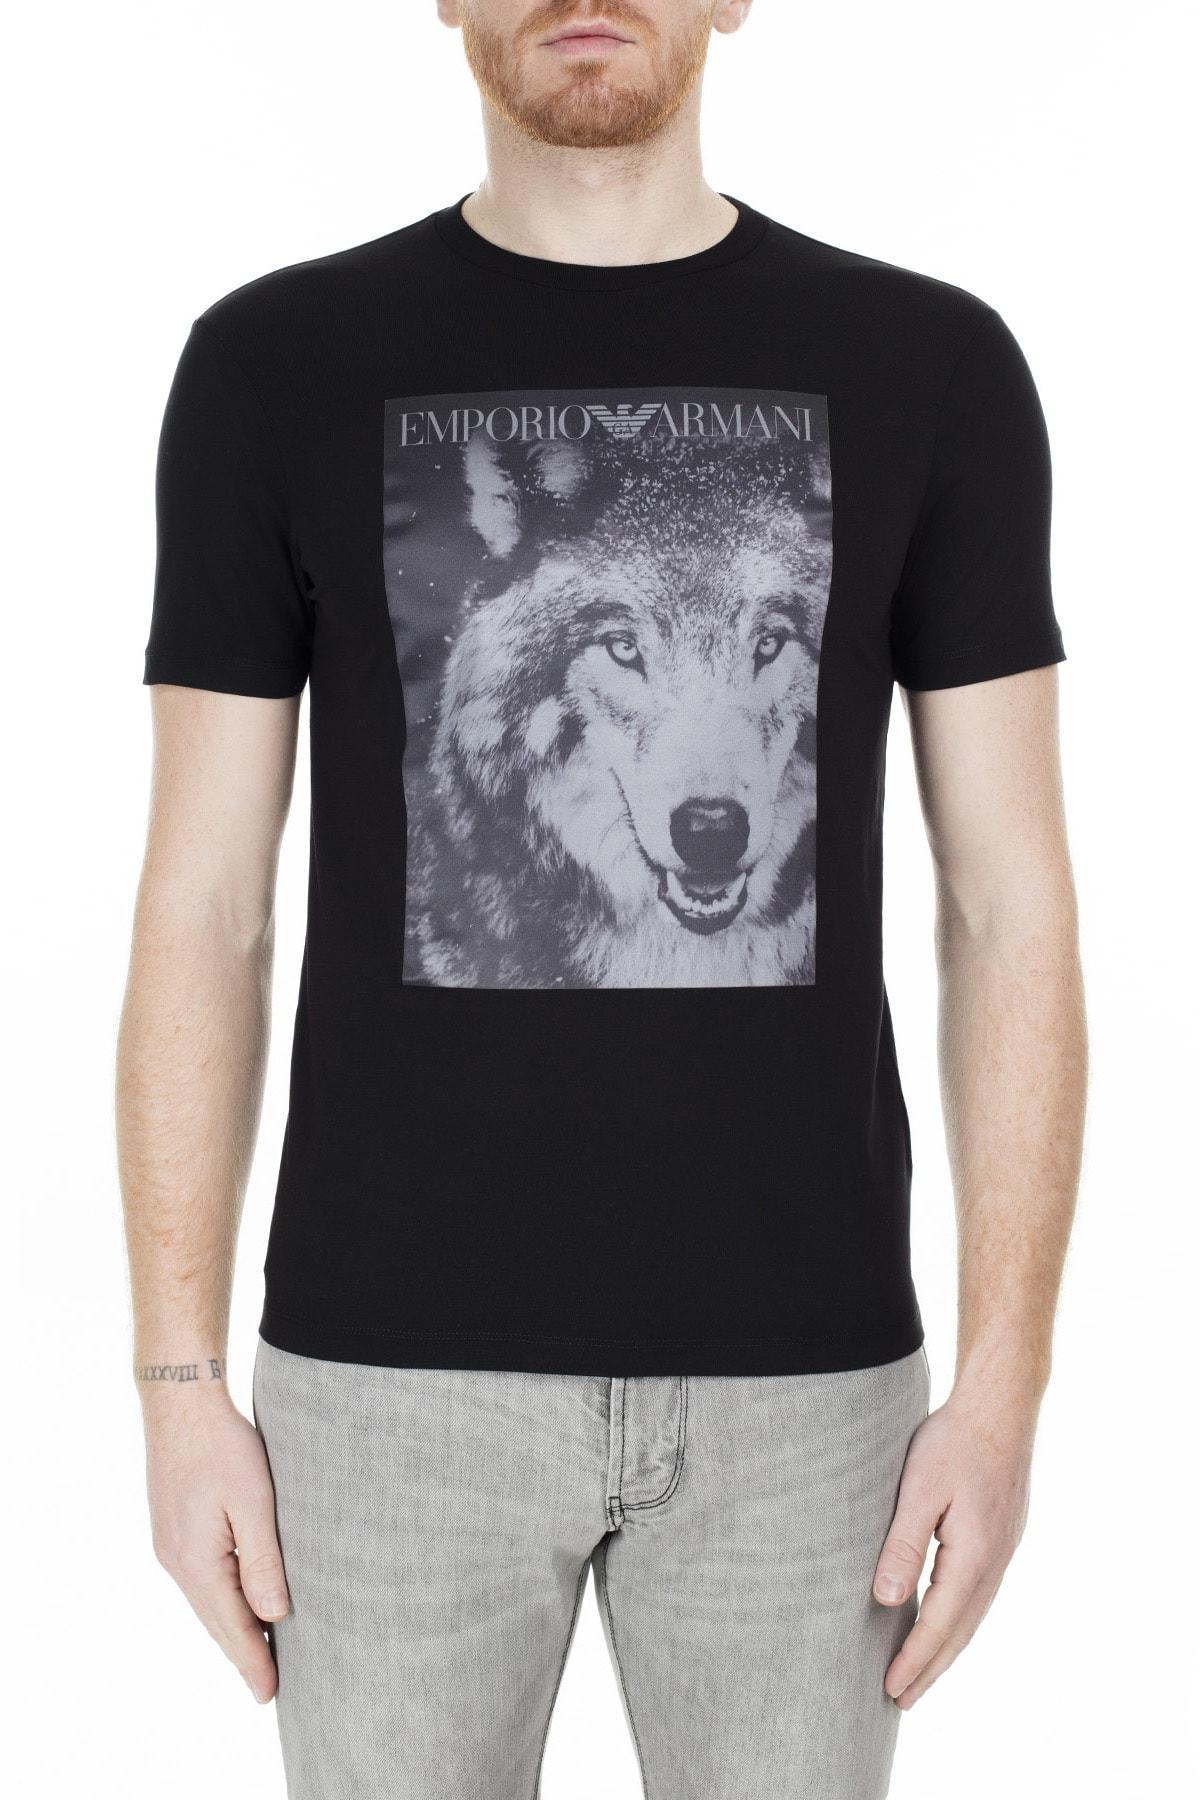 Emporio Armani T Shirt Erkek T Shirt S 6G1T77 1J19Z 0999 S 6G1T77 1J19Z 0999